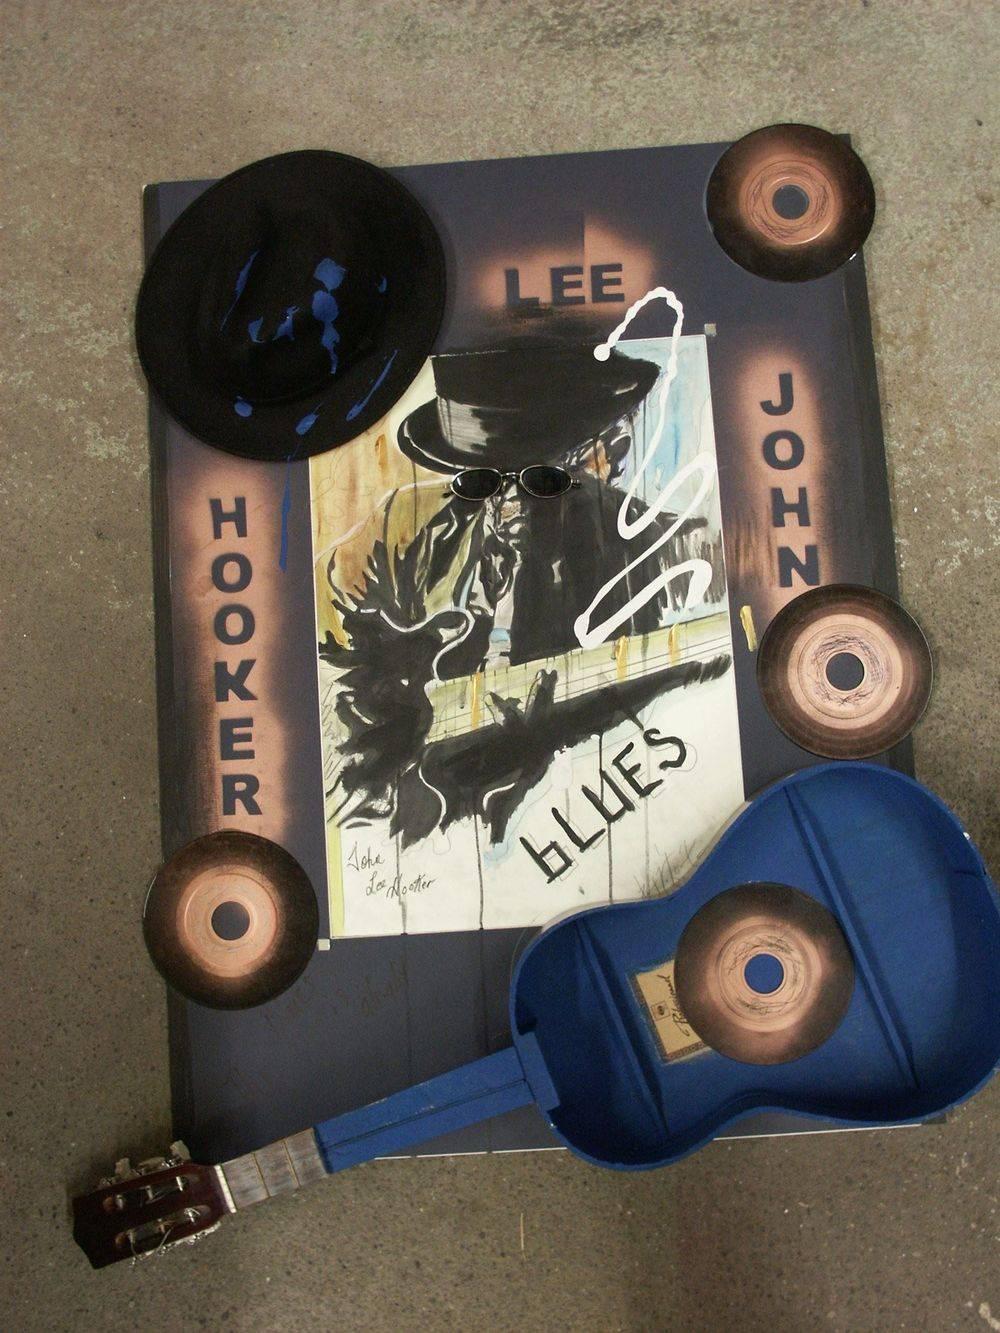 John Lee Hooker 70 x 100 cm